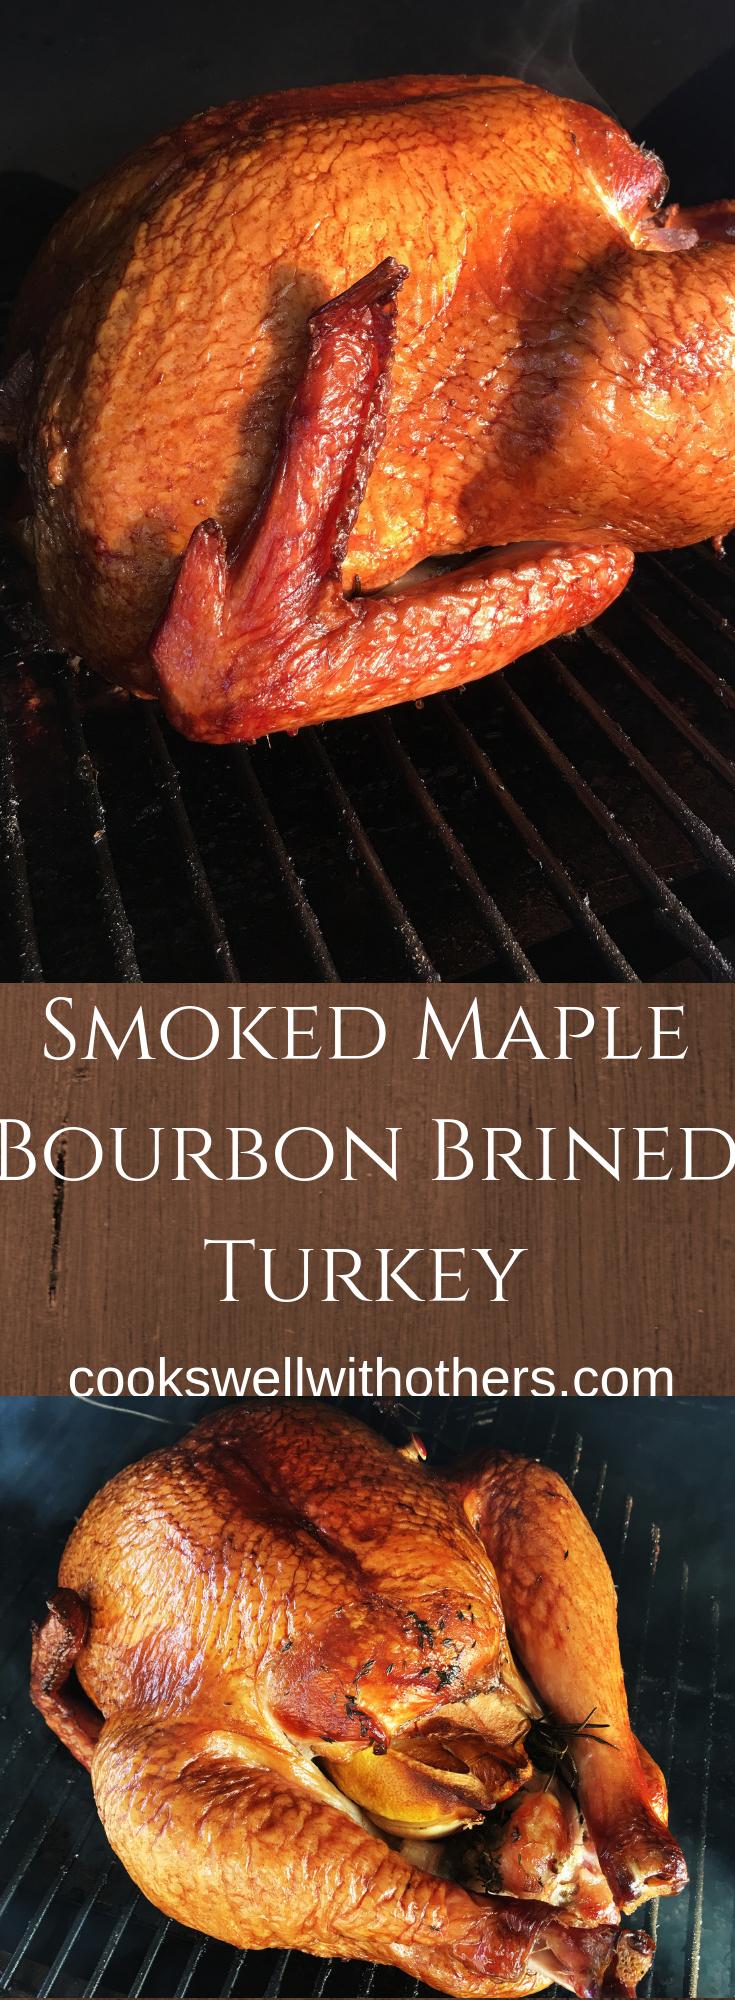 Photo of Smoked Maple Bourbon Brined Turkey